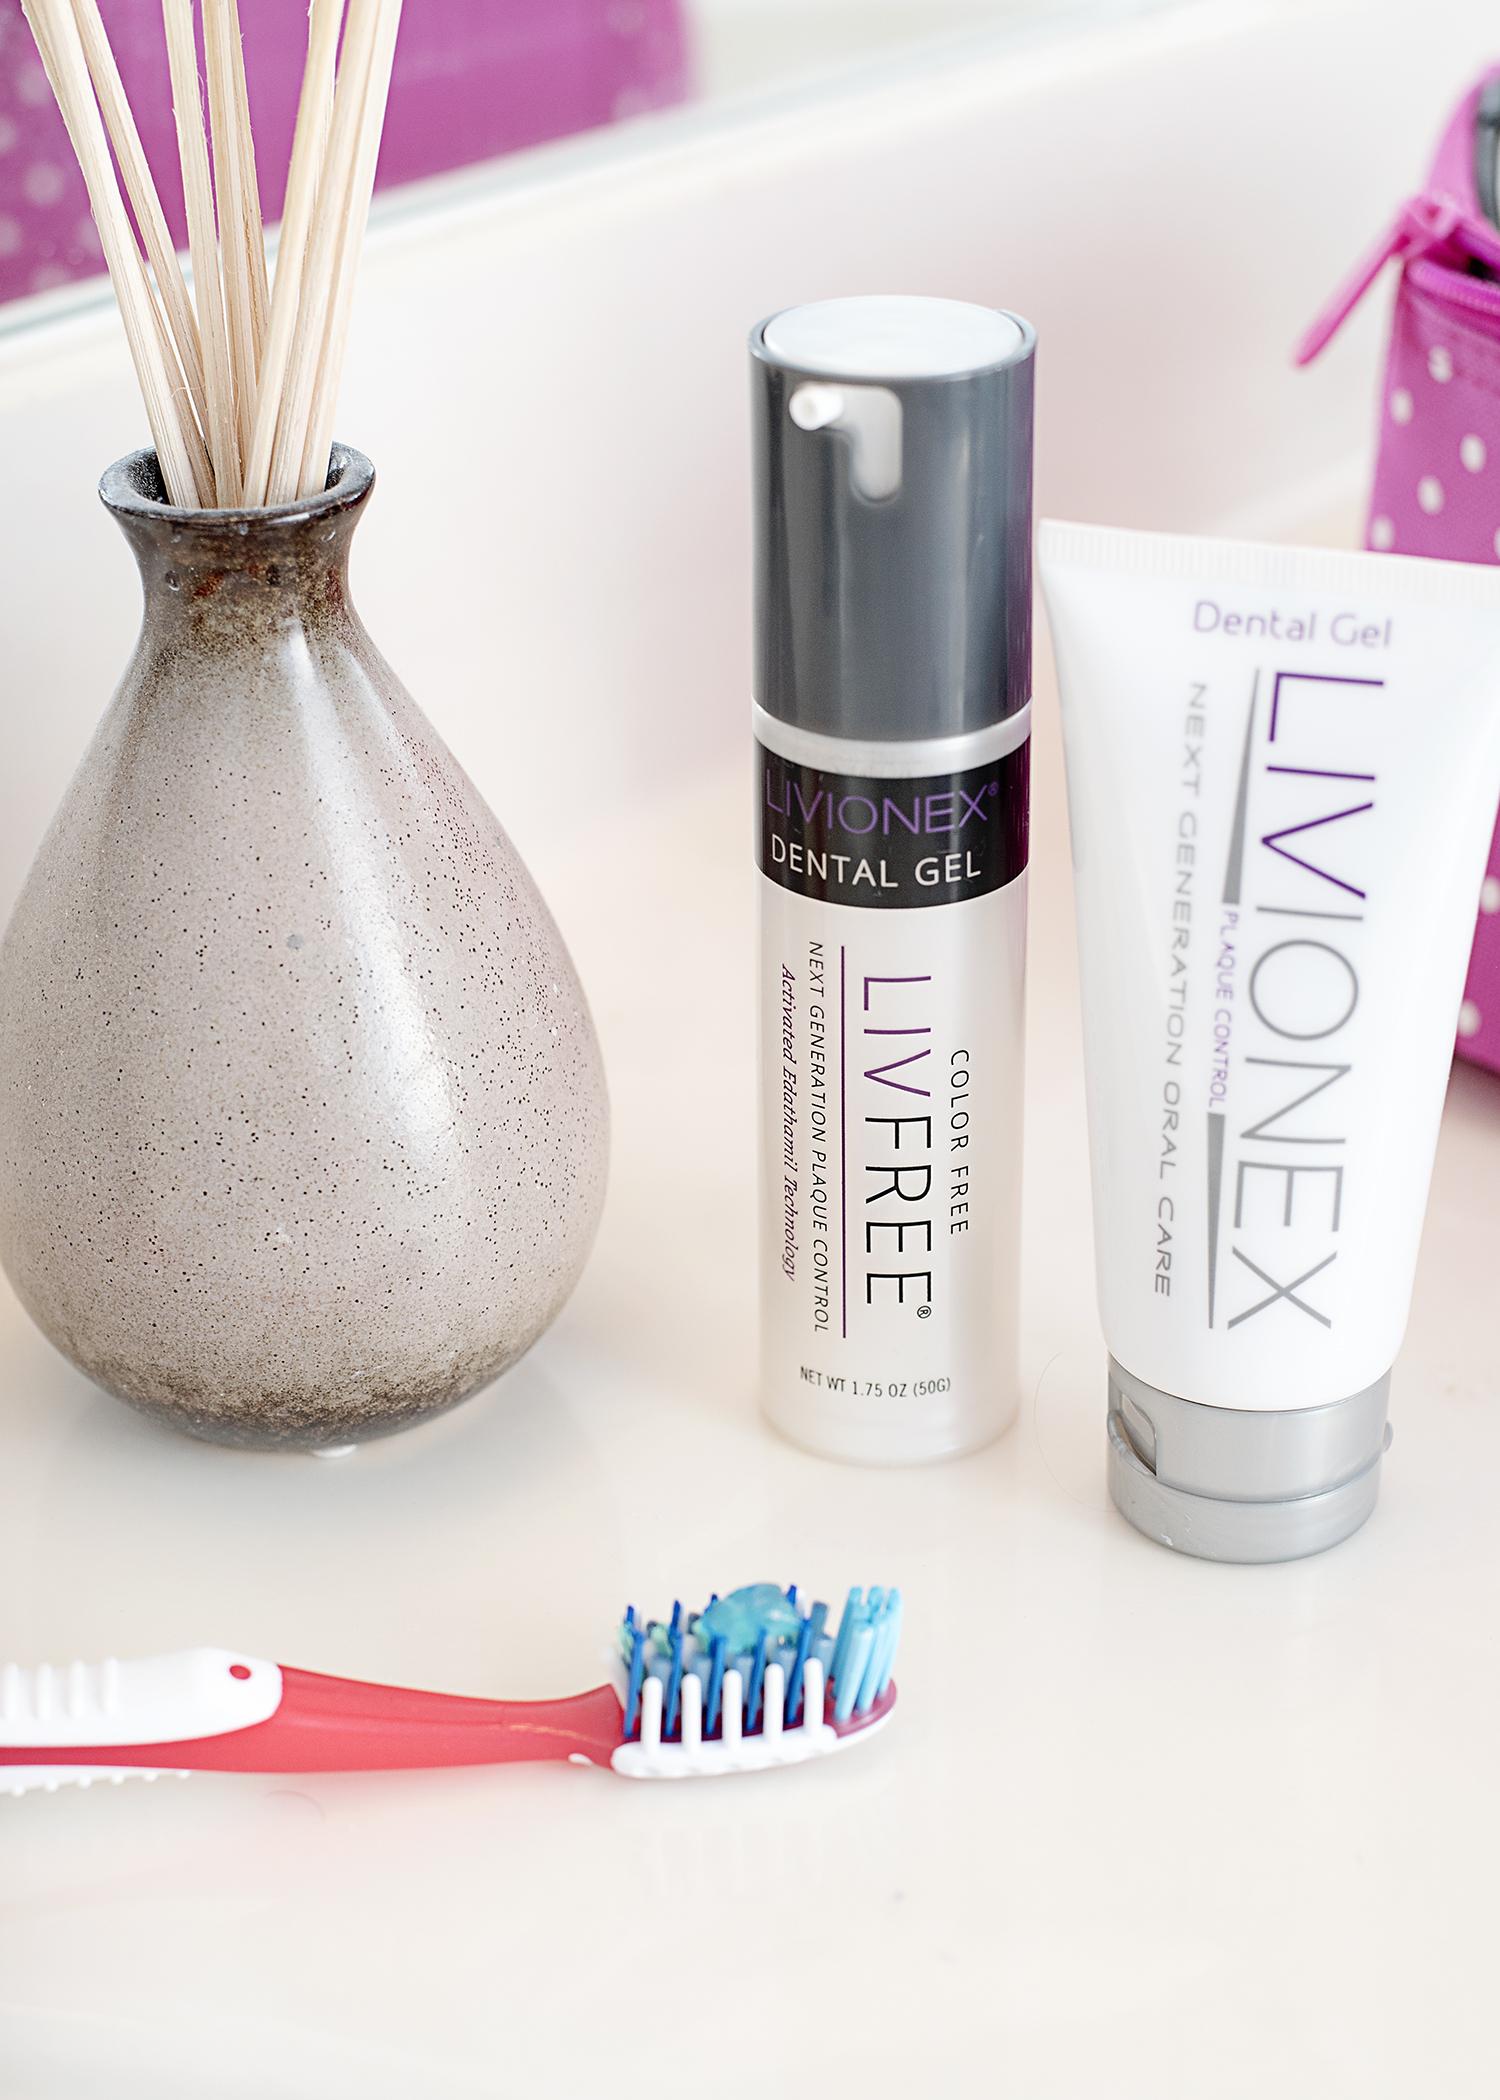 Livionex Dental Gel - A Game Changer in Oral Care